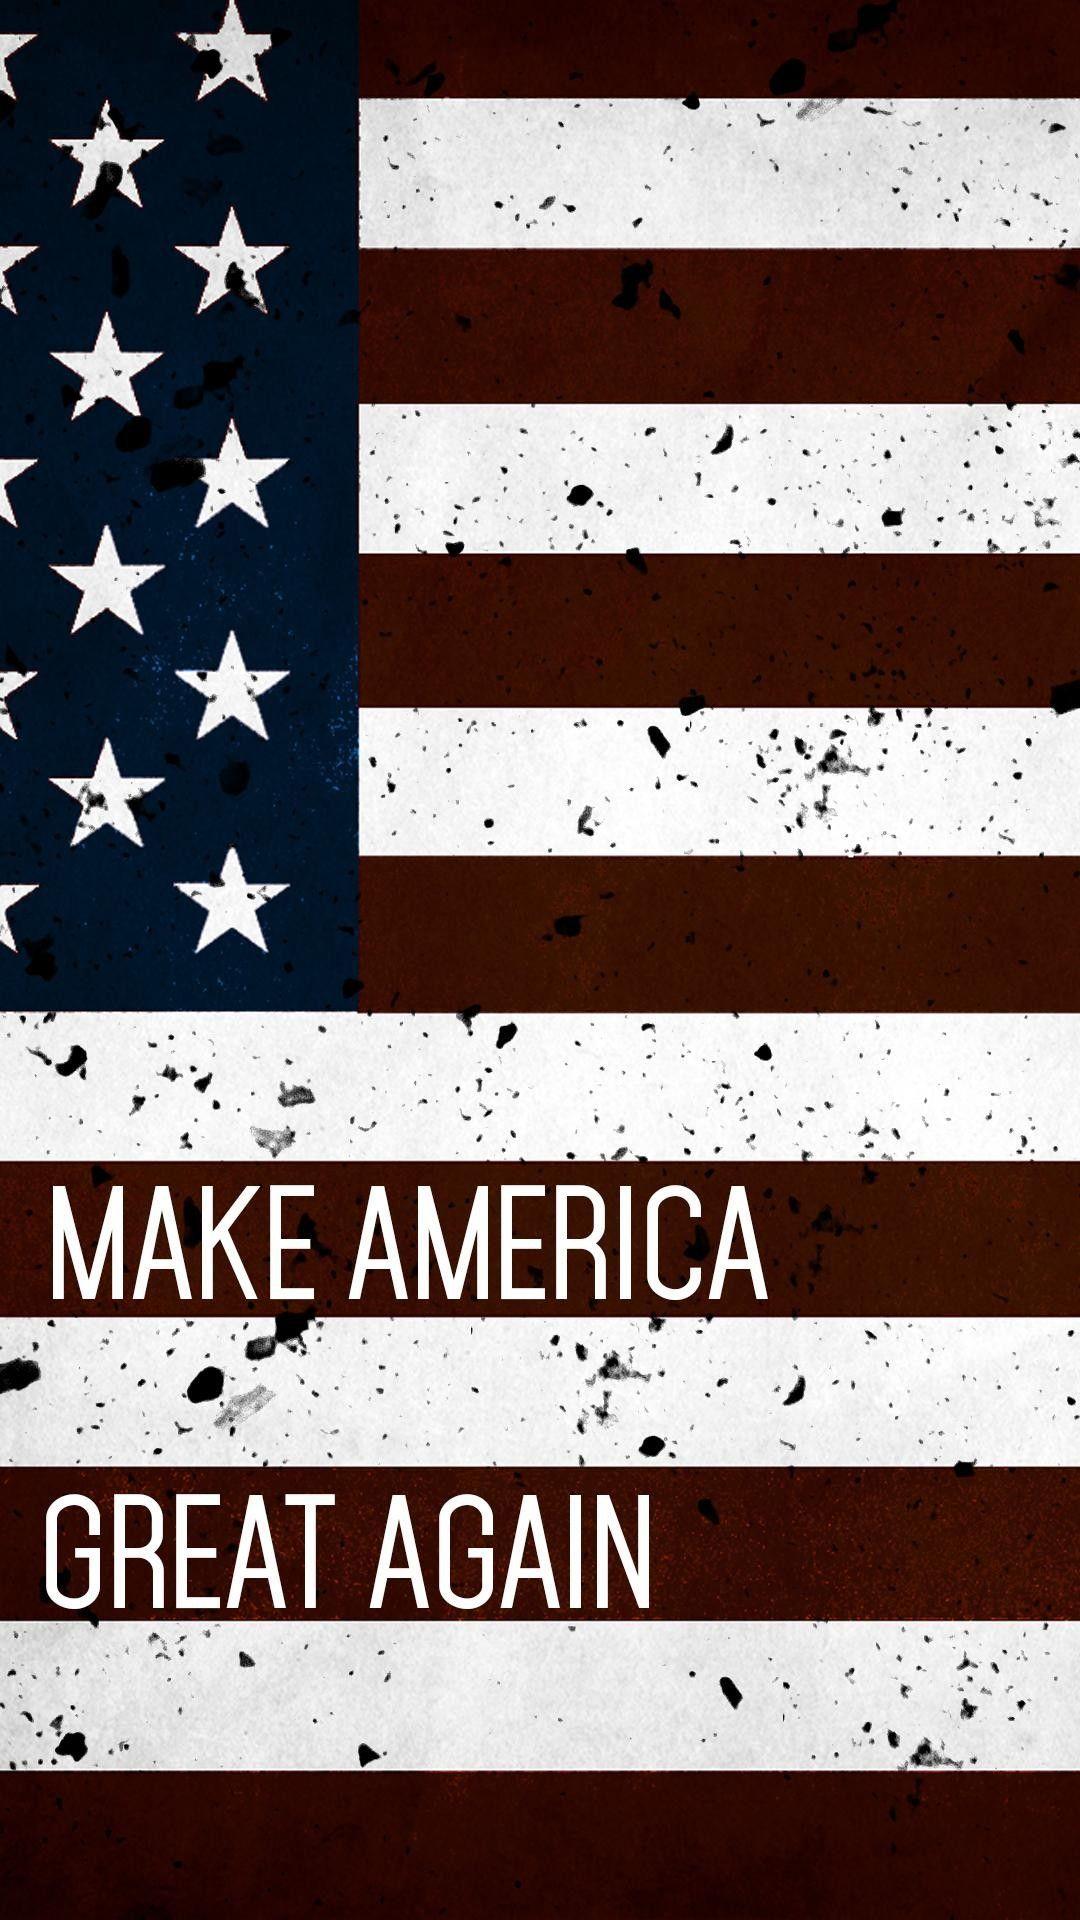 Download Trump 2020 Wallpaper Iphone Cikimm Com In 2021 American Flag Wallpaper Iphone American Flag Wallpaper Patriotic Wallpaper